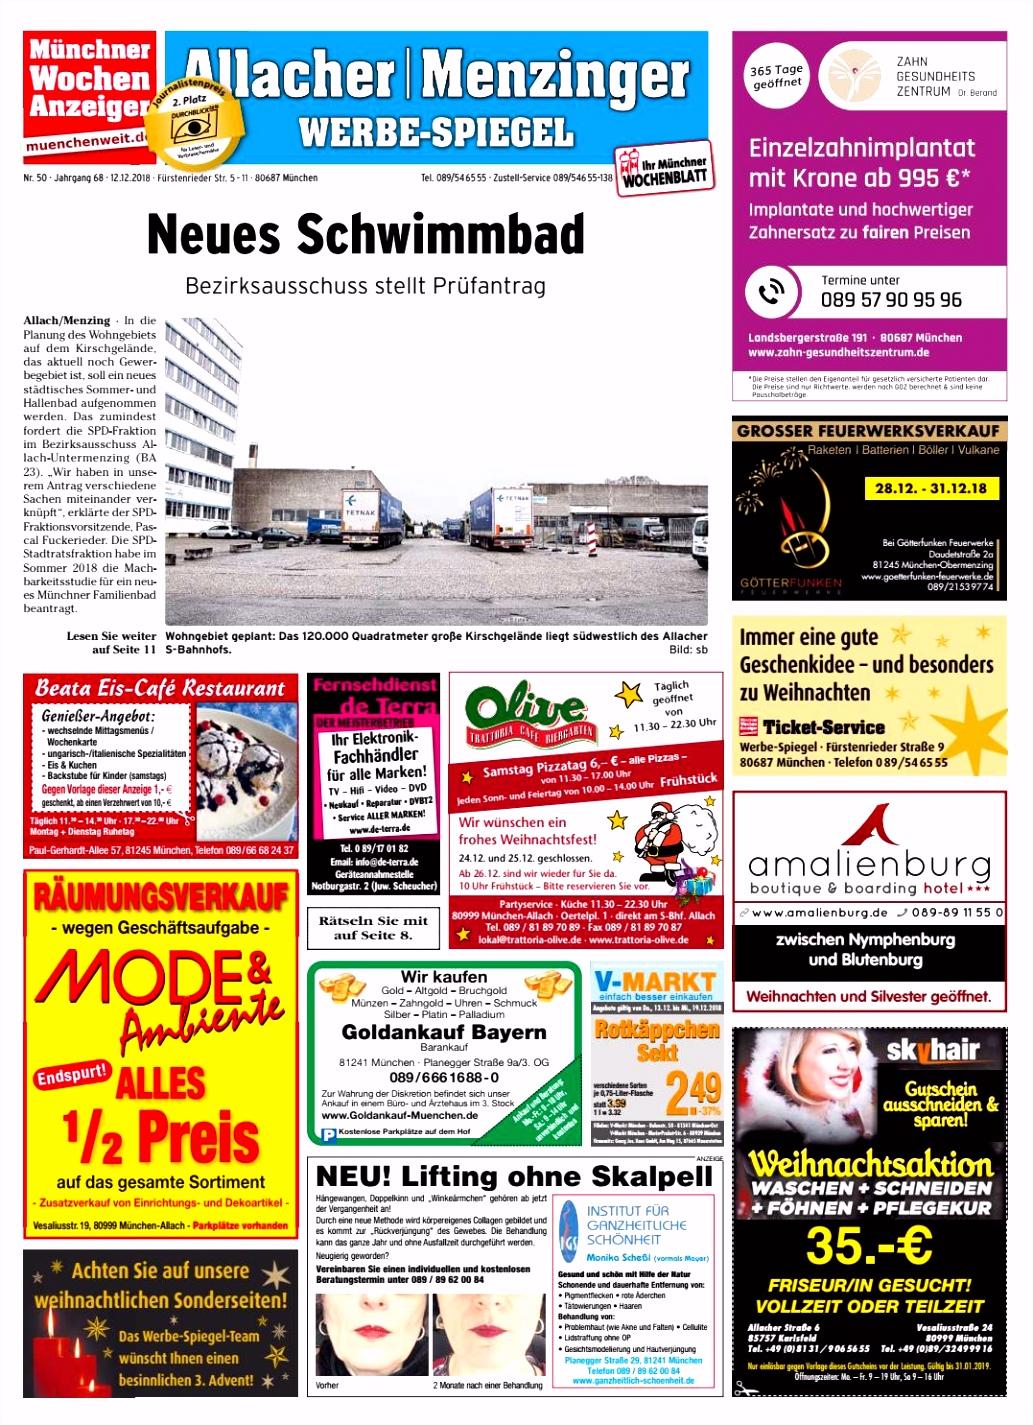 KW 50 2018 by Wochenanzeiger Me n GmbH issuu